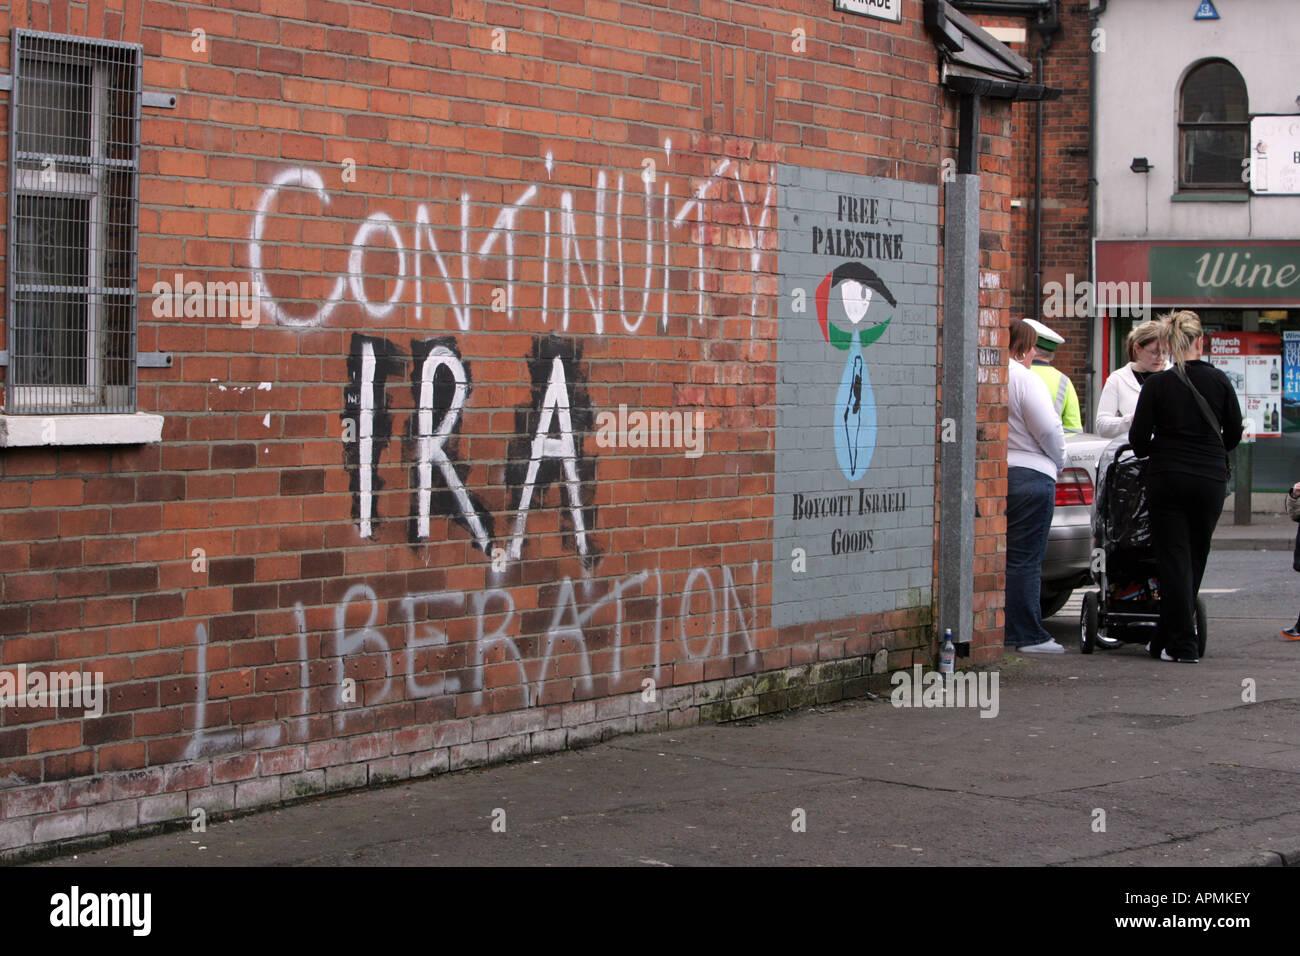 A series of Irish Republican murals on street walls around west Belfast, Northern Ireland. - Stock Image